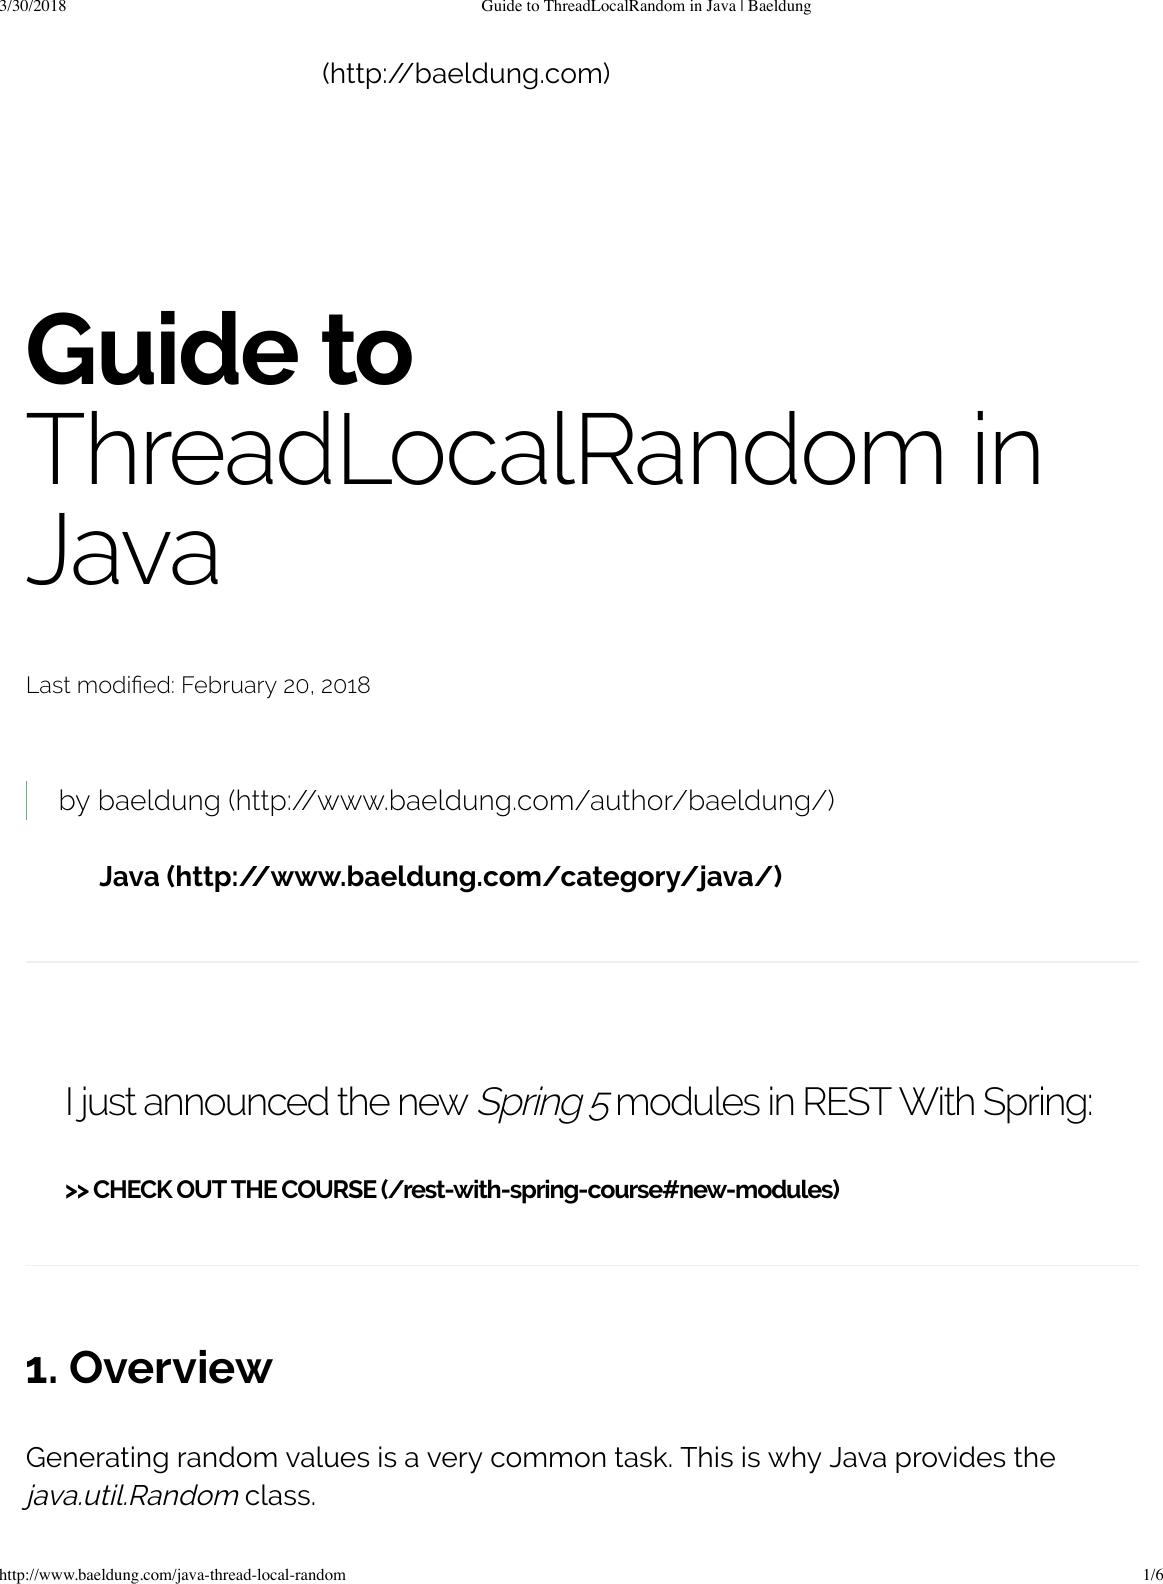 Guide To Thread Local Random In Java Baeldung